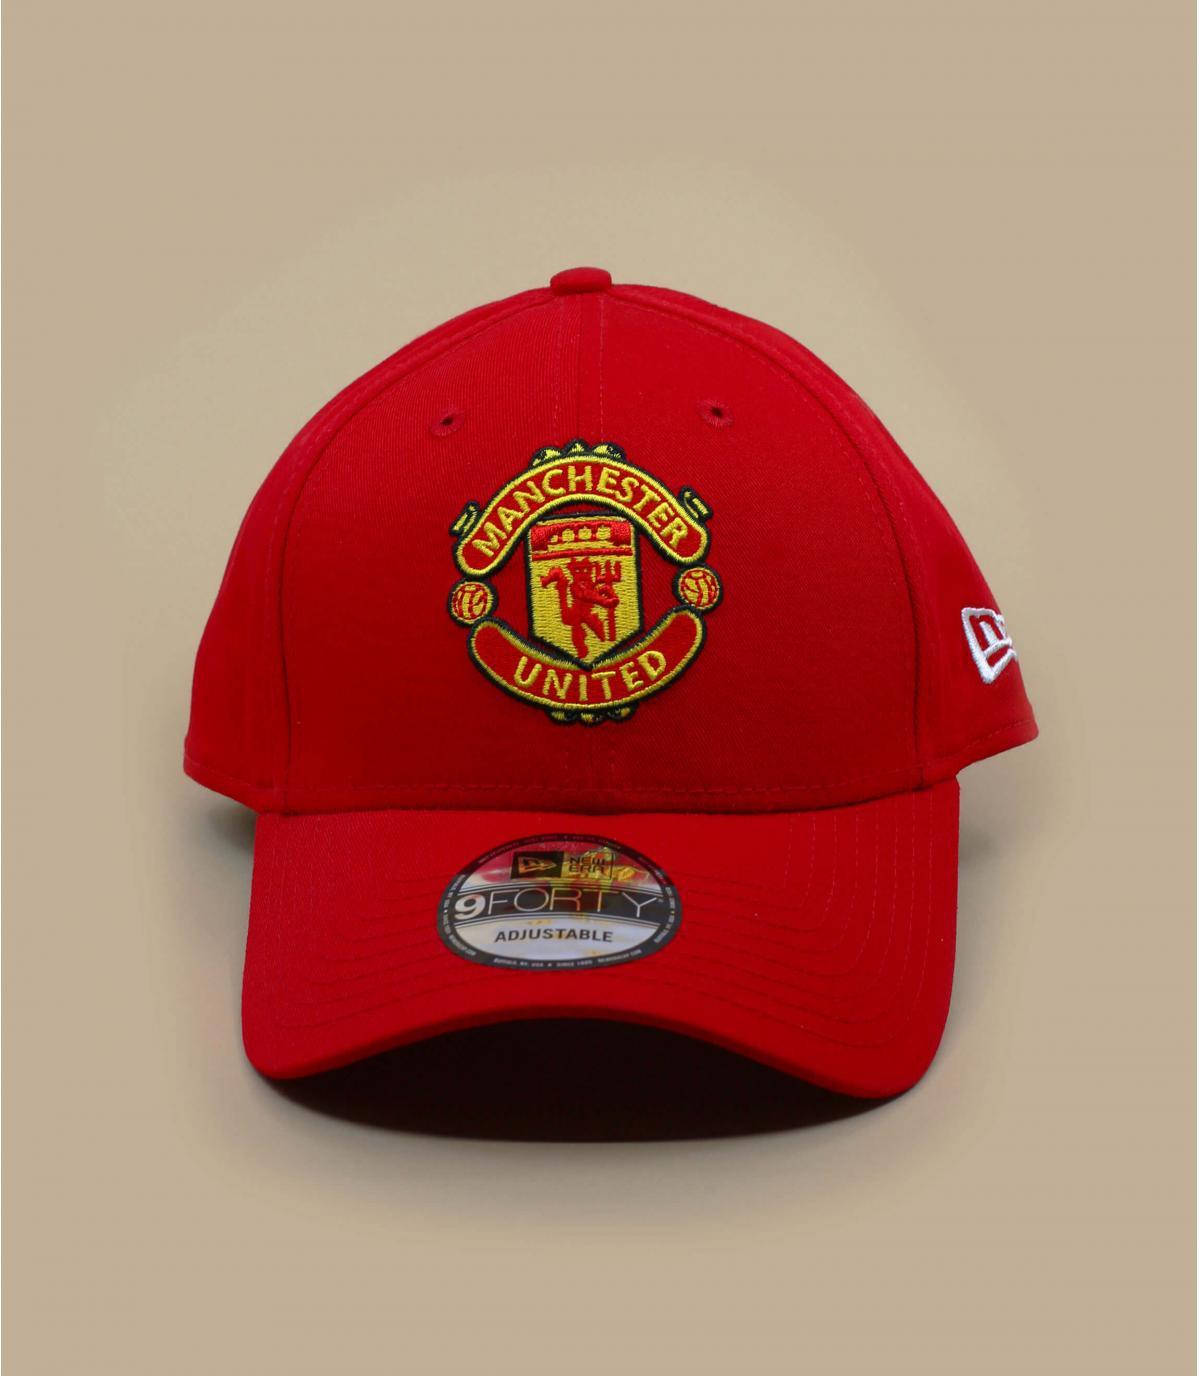 Détails Casquette Manchester United red - image 2